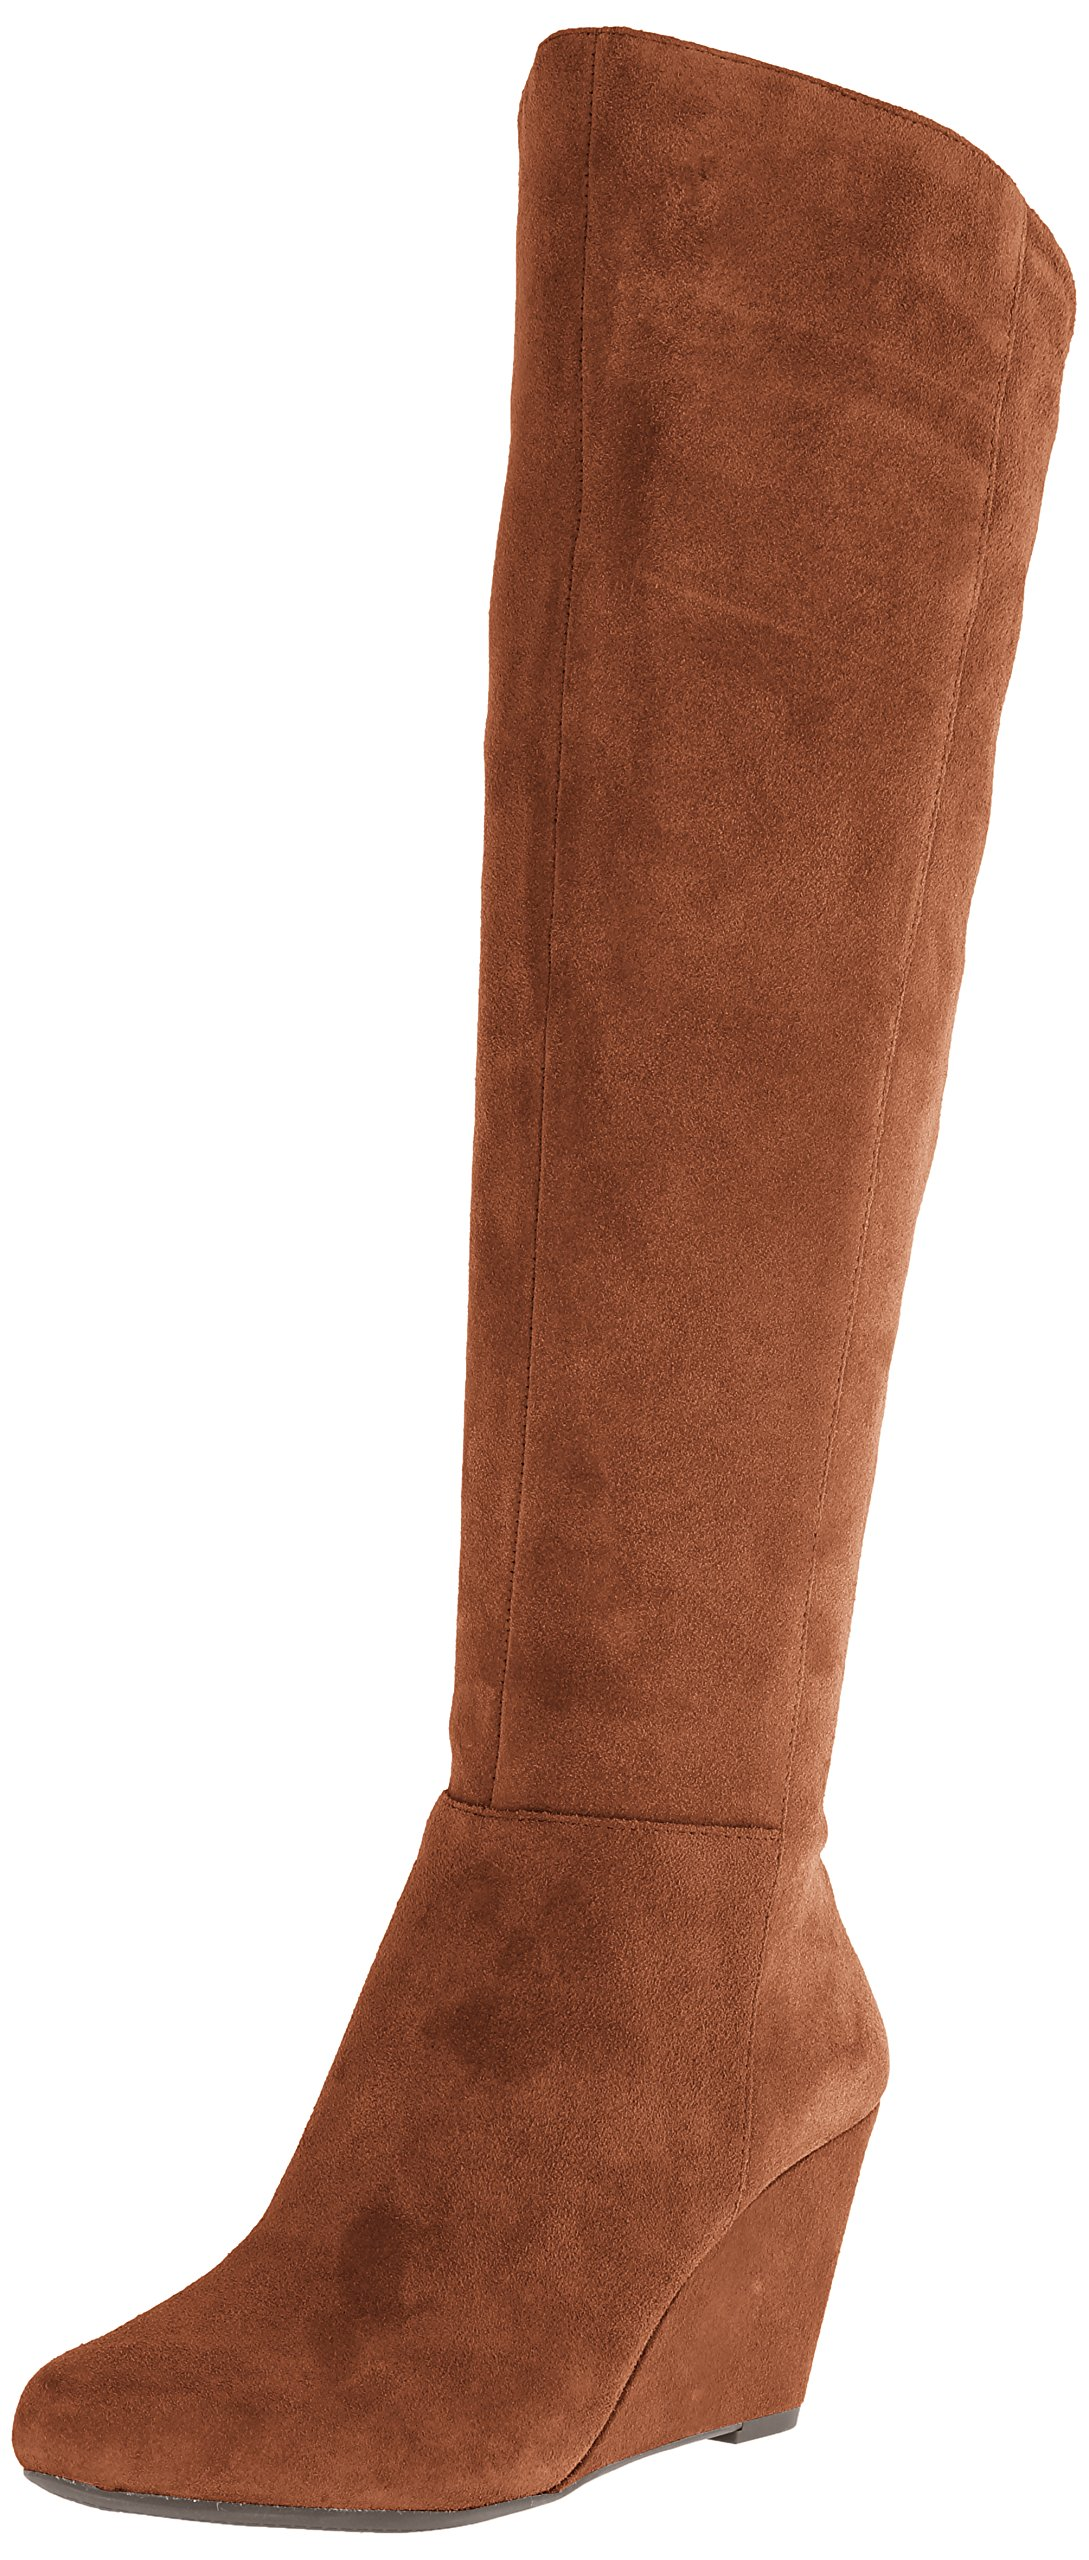 Jessica Simpson Women's royle Winter Boot, Canela Brown, 9 M US